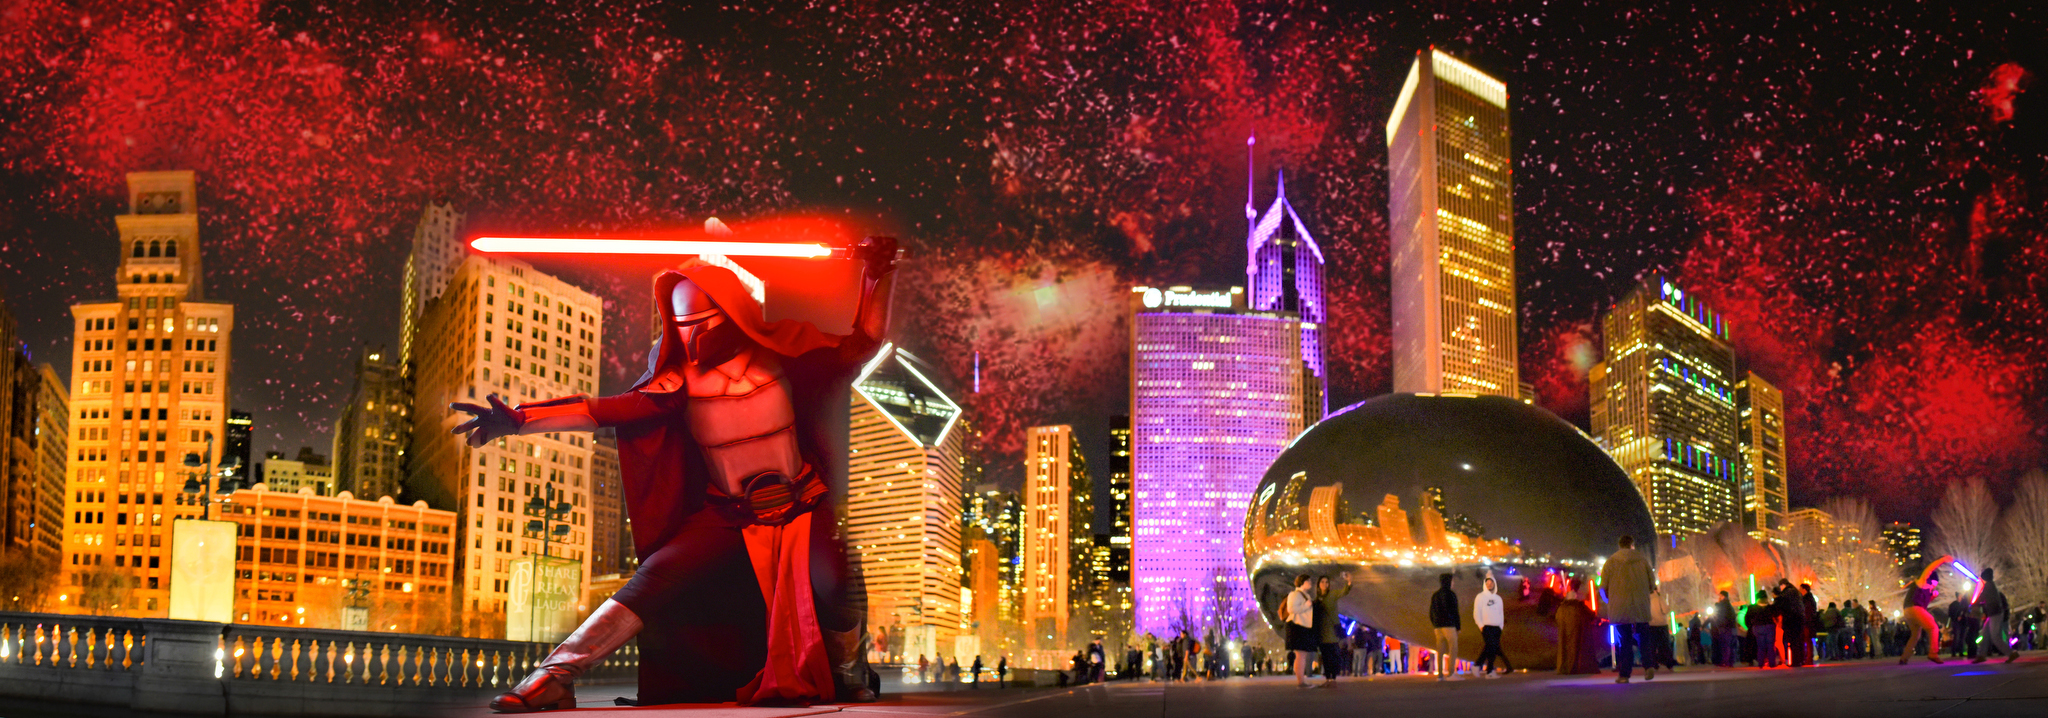 2019.04.14 - Star Wars Celebration Chicago 288835.JPG